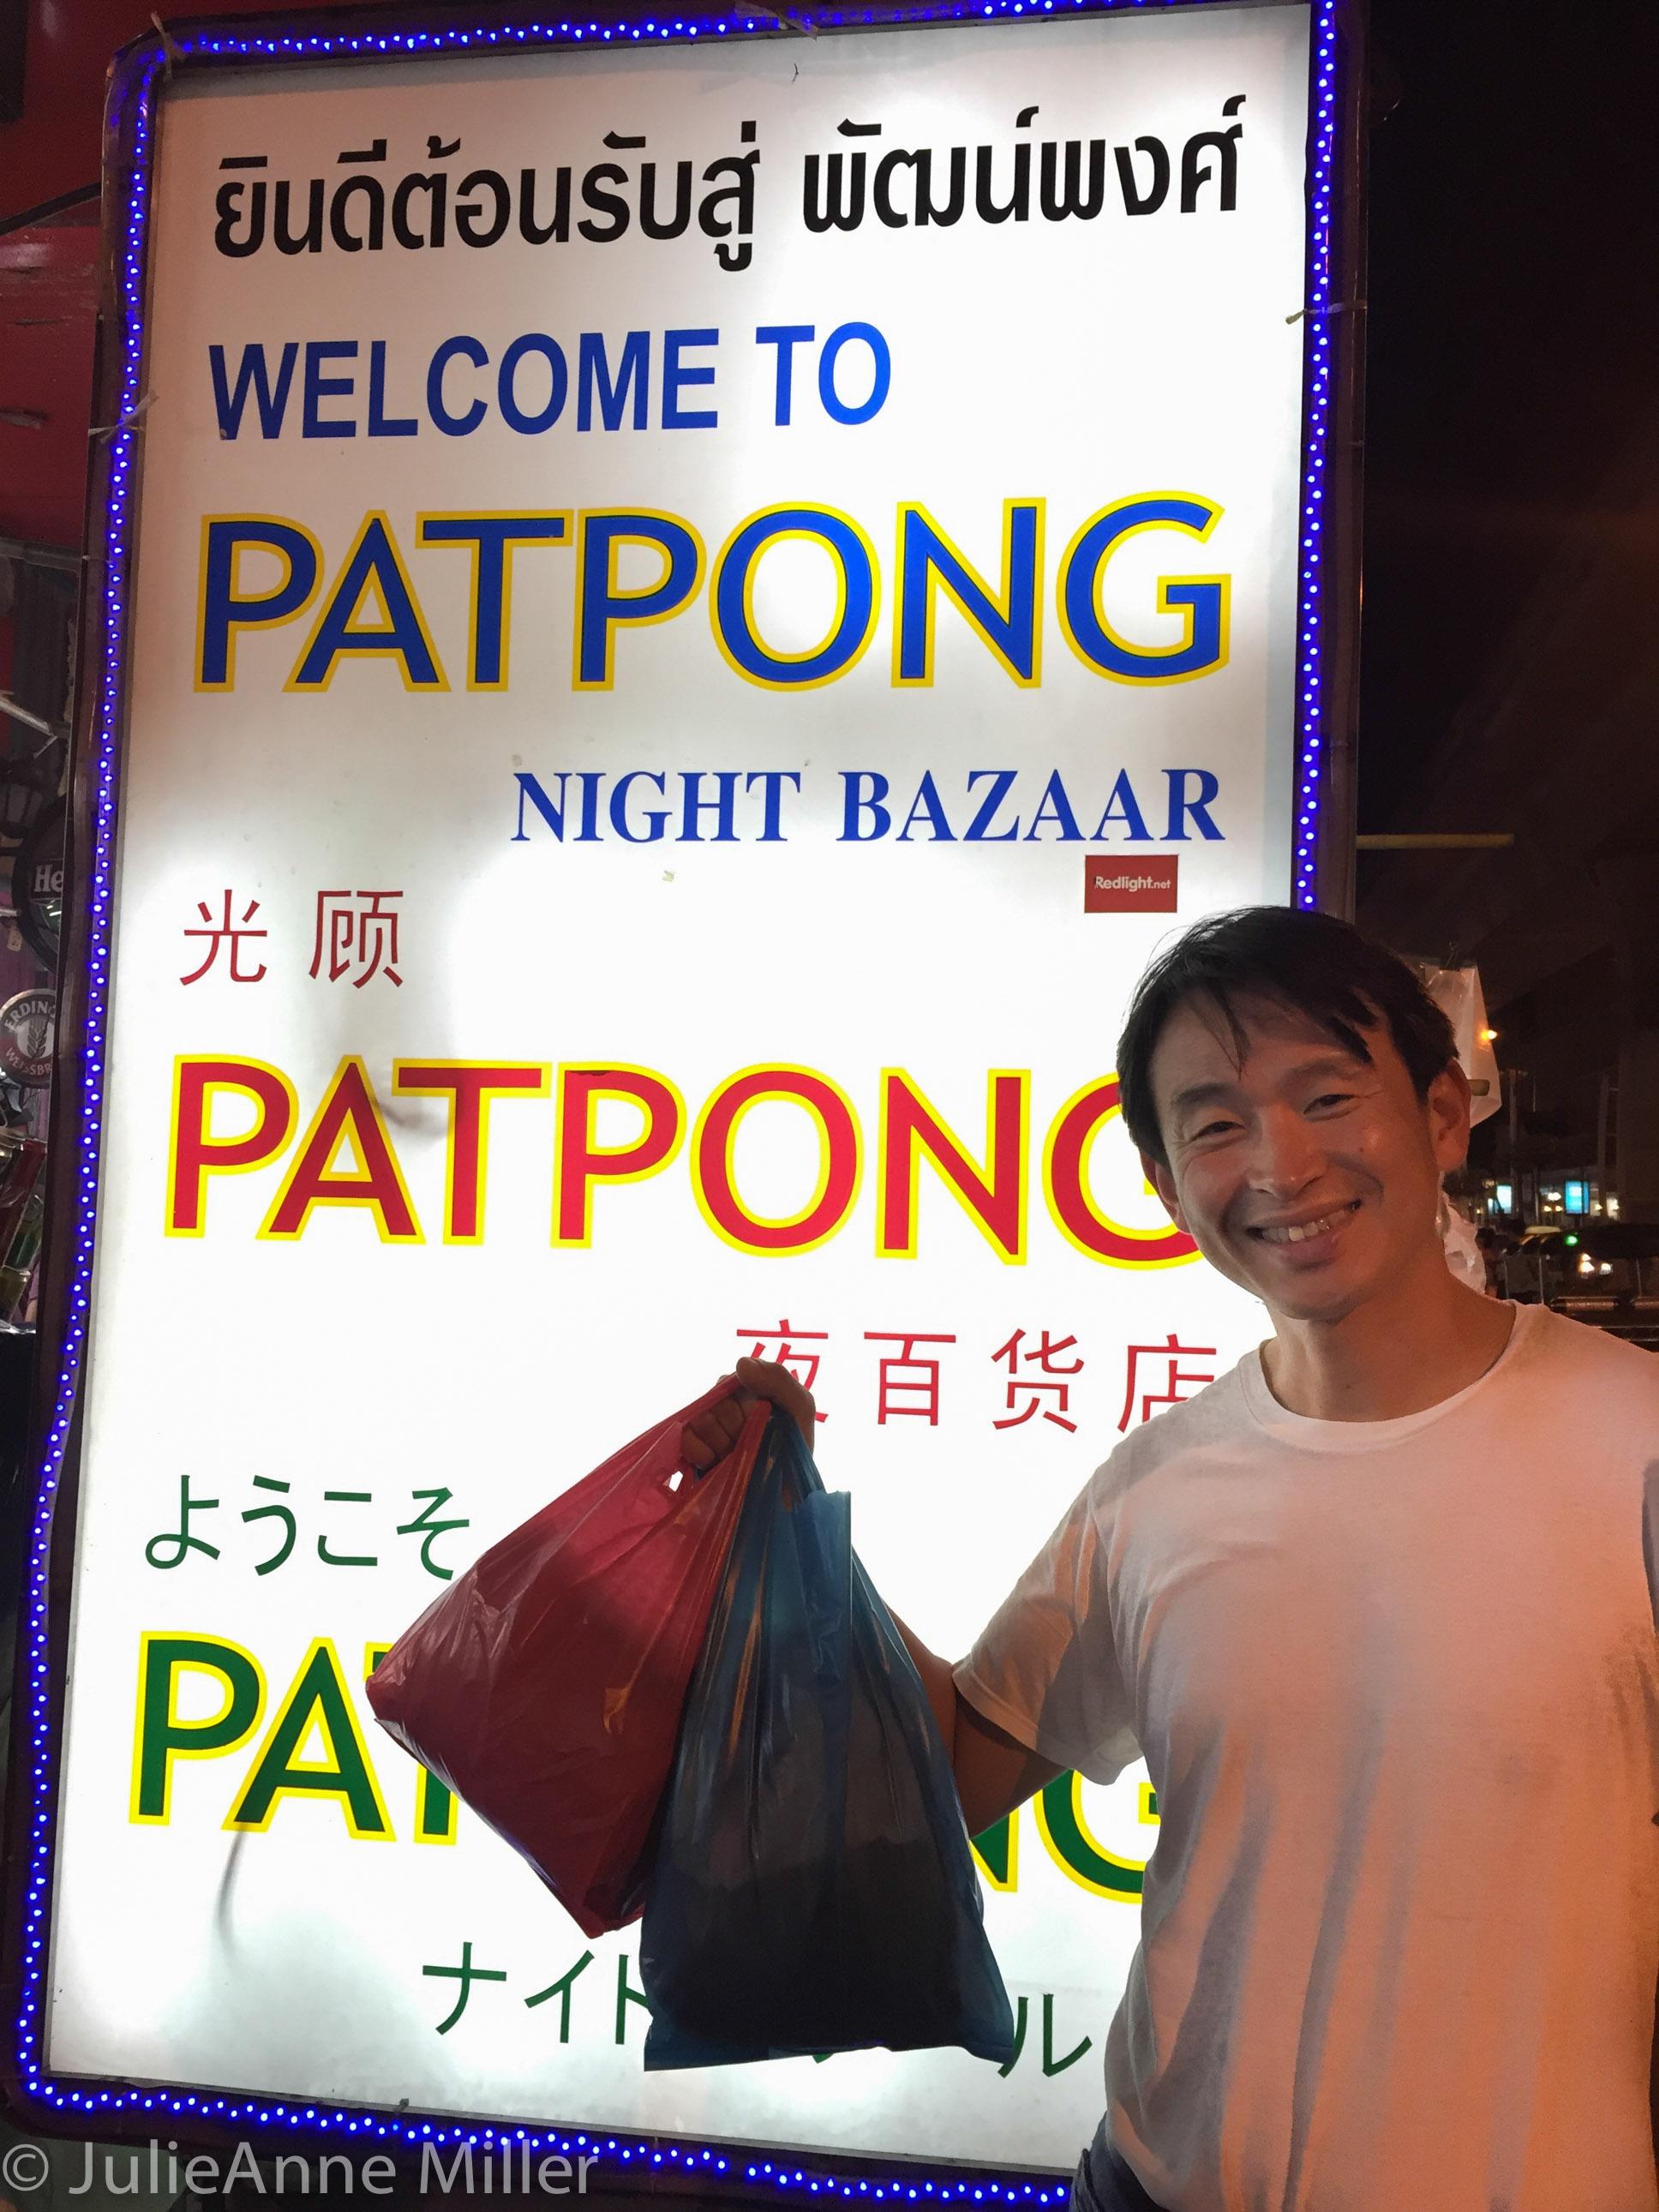 Patpong Night Market